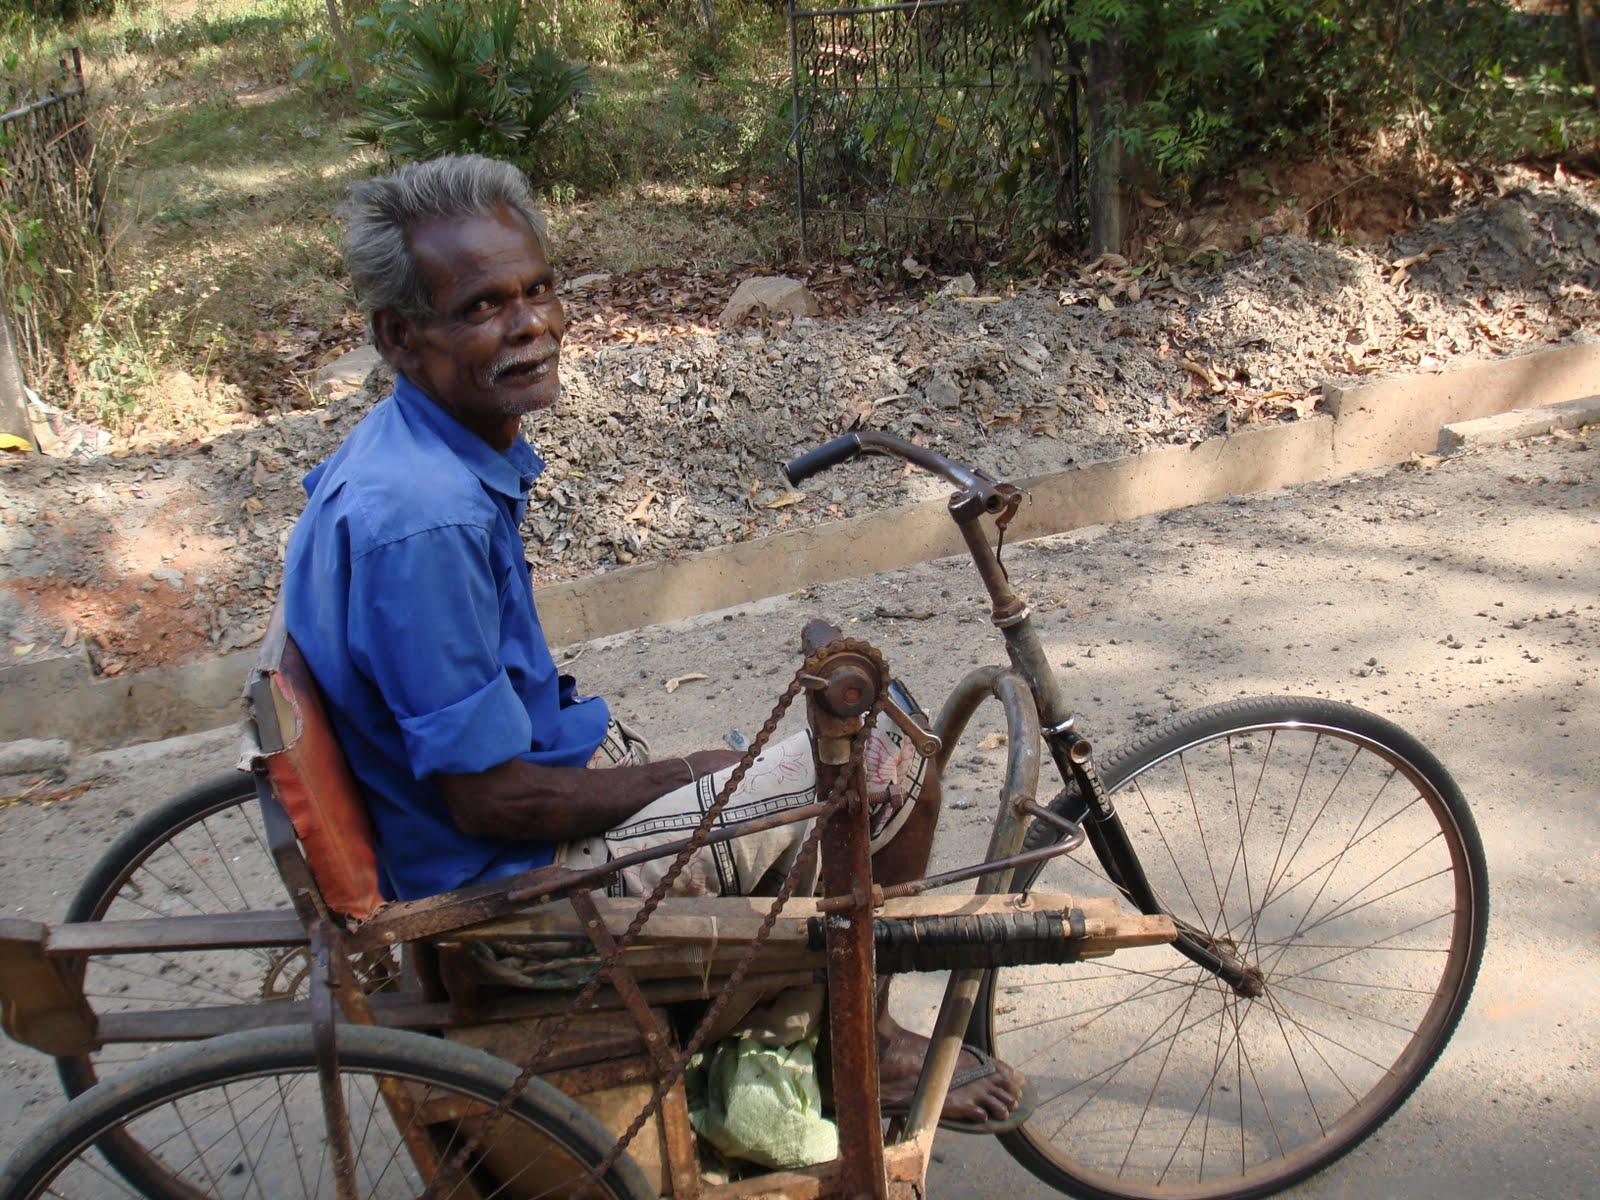 Swing Chair Sri Lanka Office Depot Global Abilities A Hard Lankan Life Living With